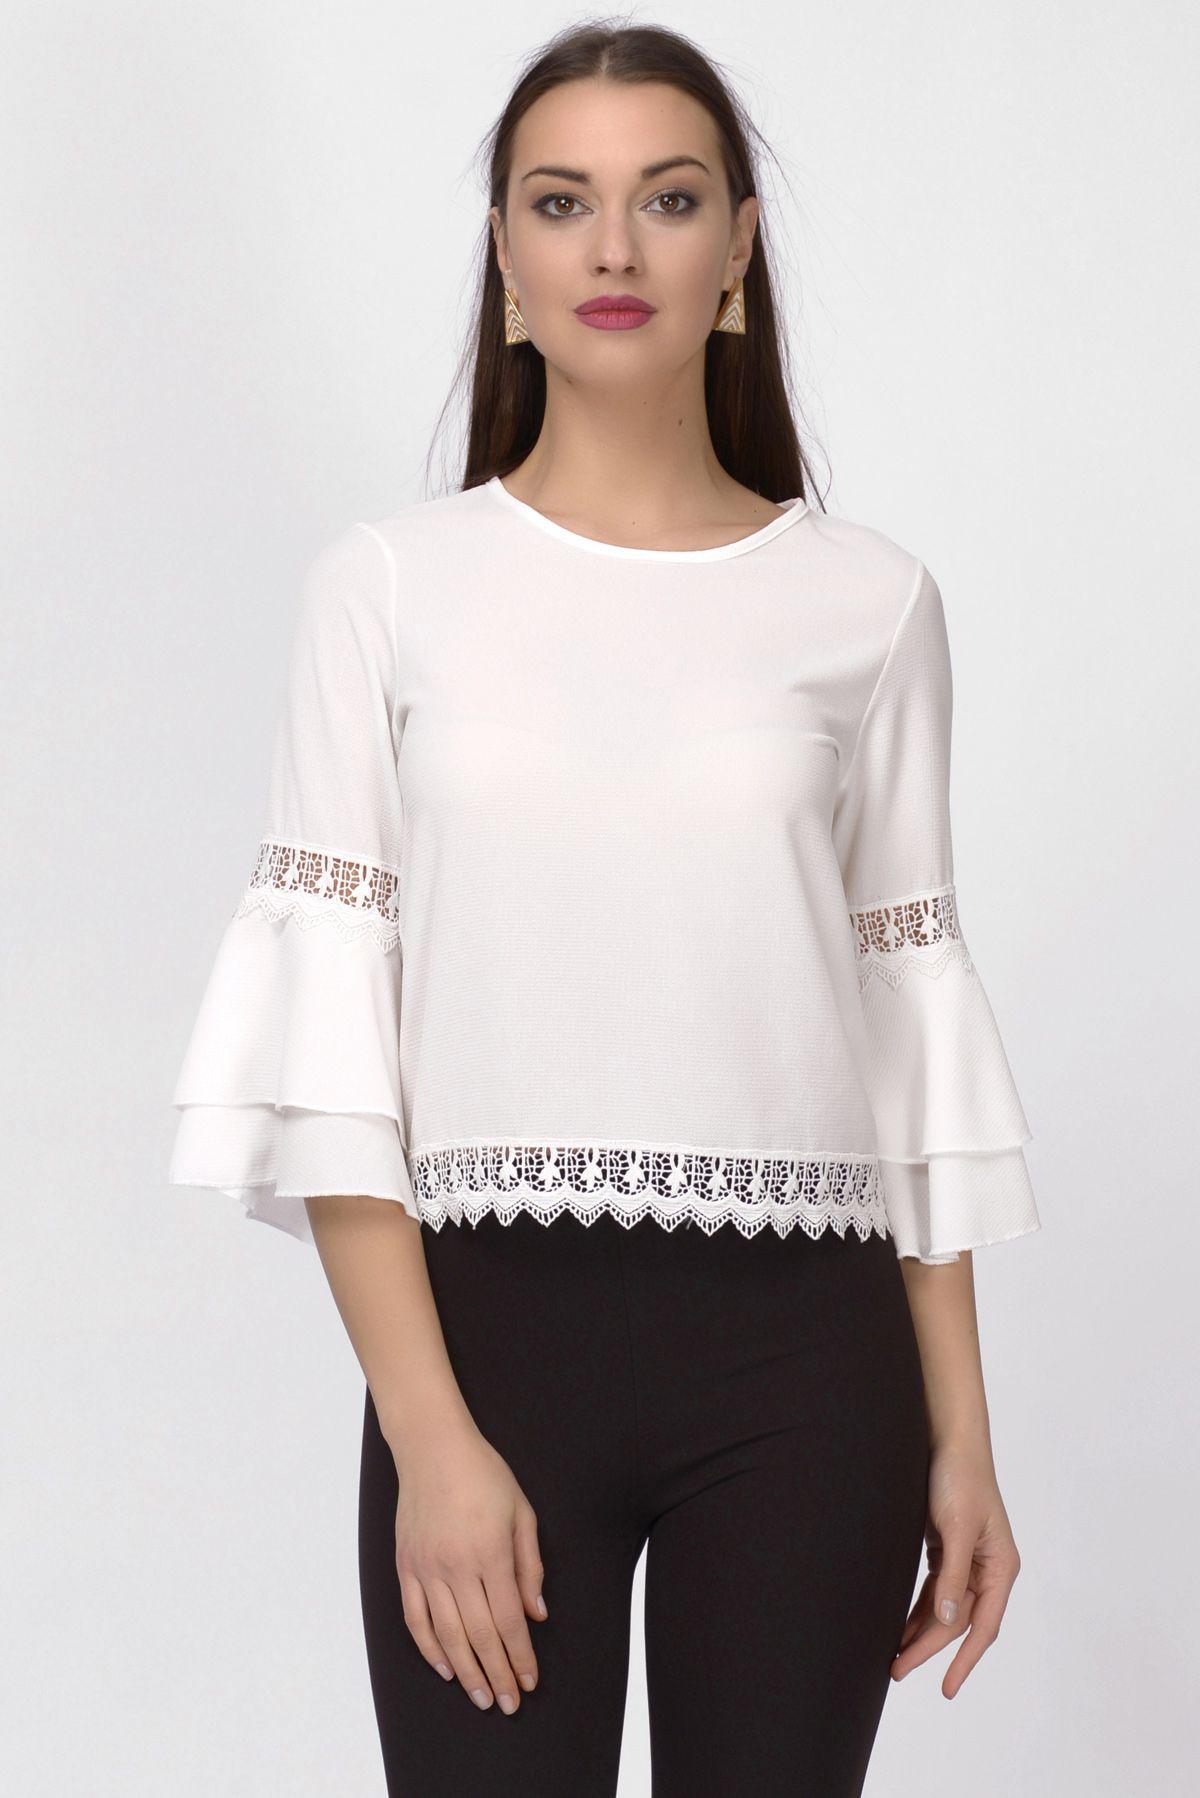 White Ruffle Cuff Elbow Sleeve Top Σχέδια Για Μπλούζες b7ff0db599e